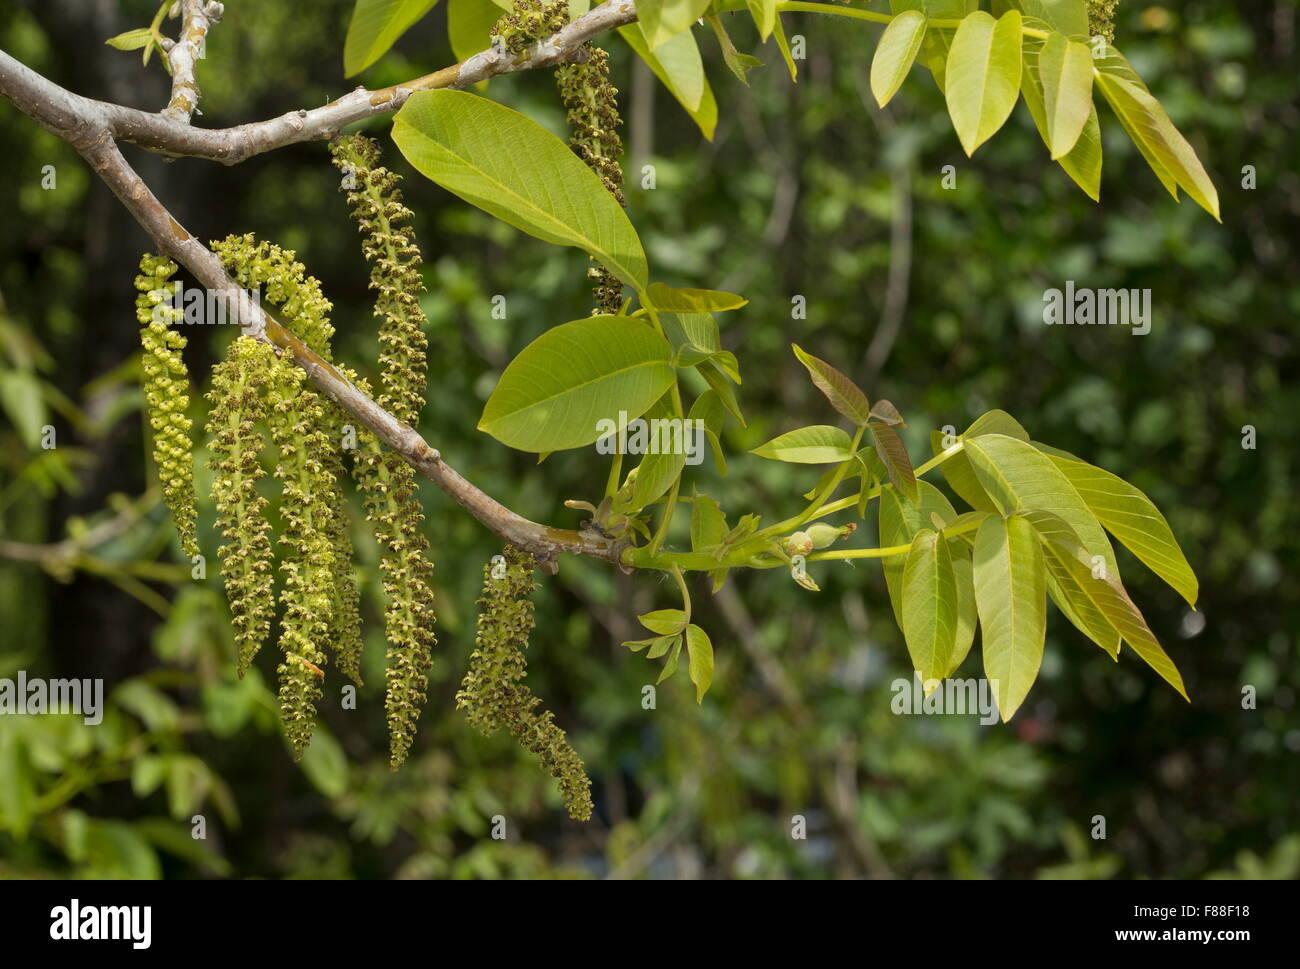 walnut tree juglans regia in flower with catkins stock. Black Bedroom Furniture Sets. Home Design Ideas